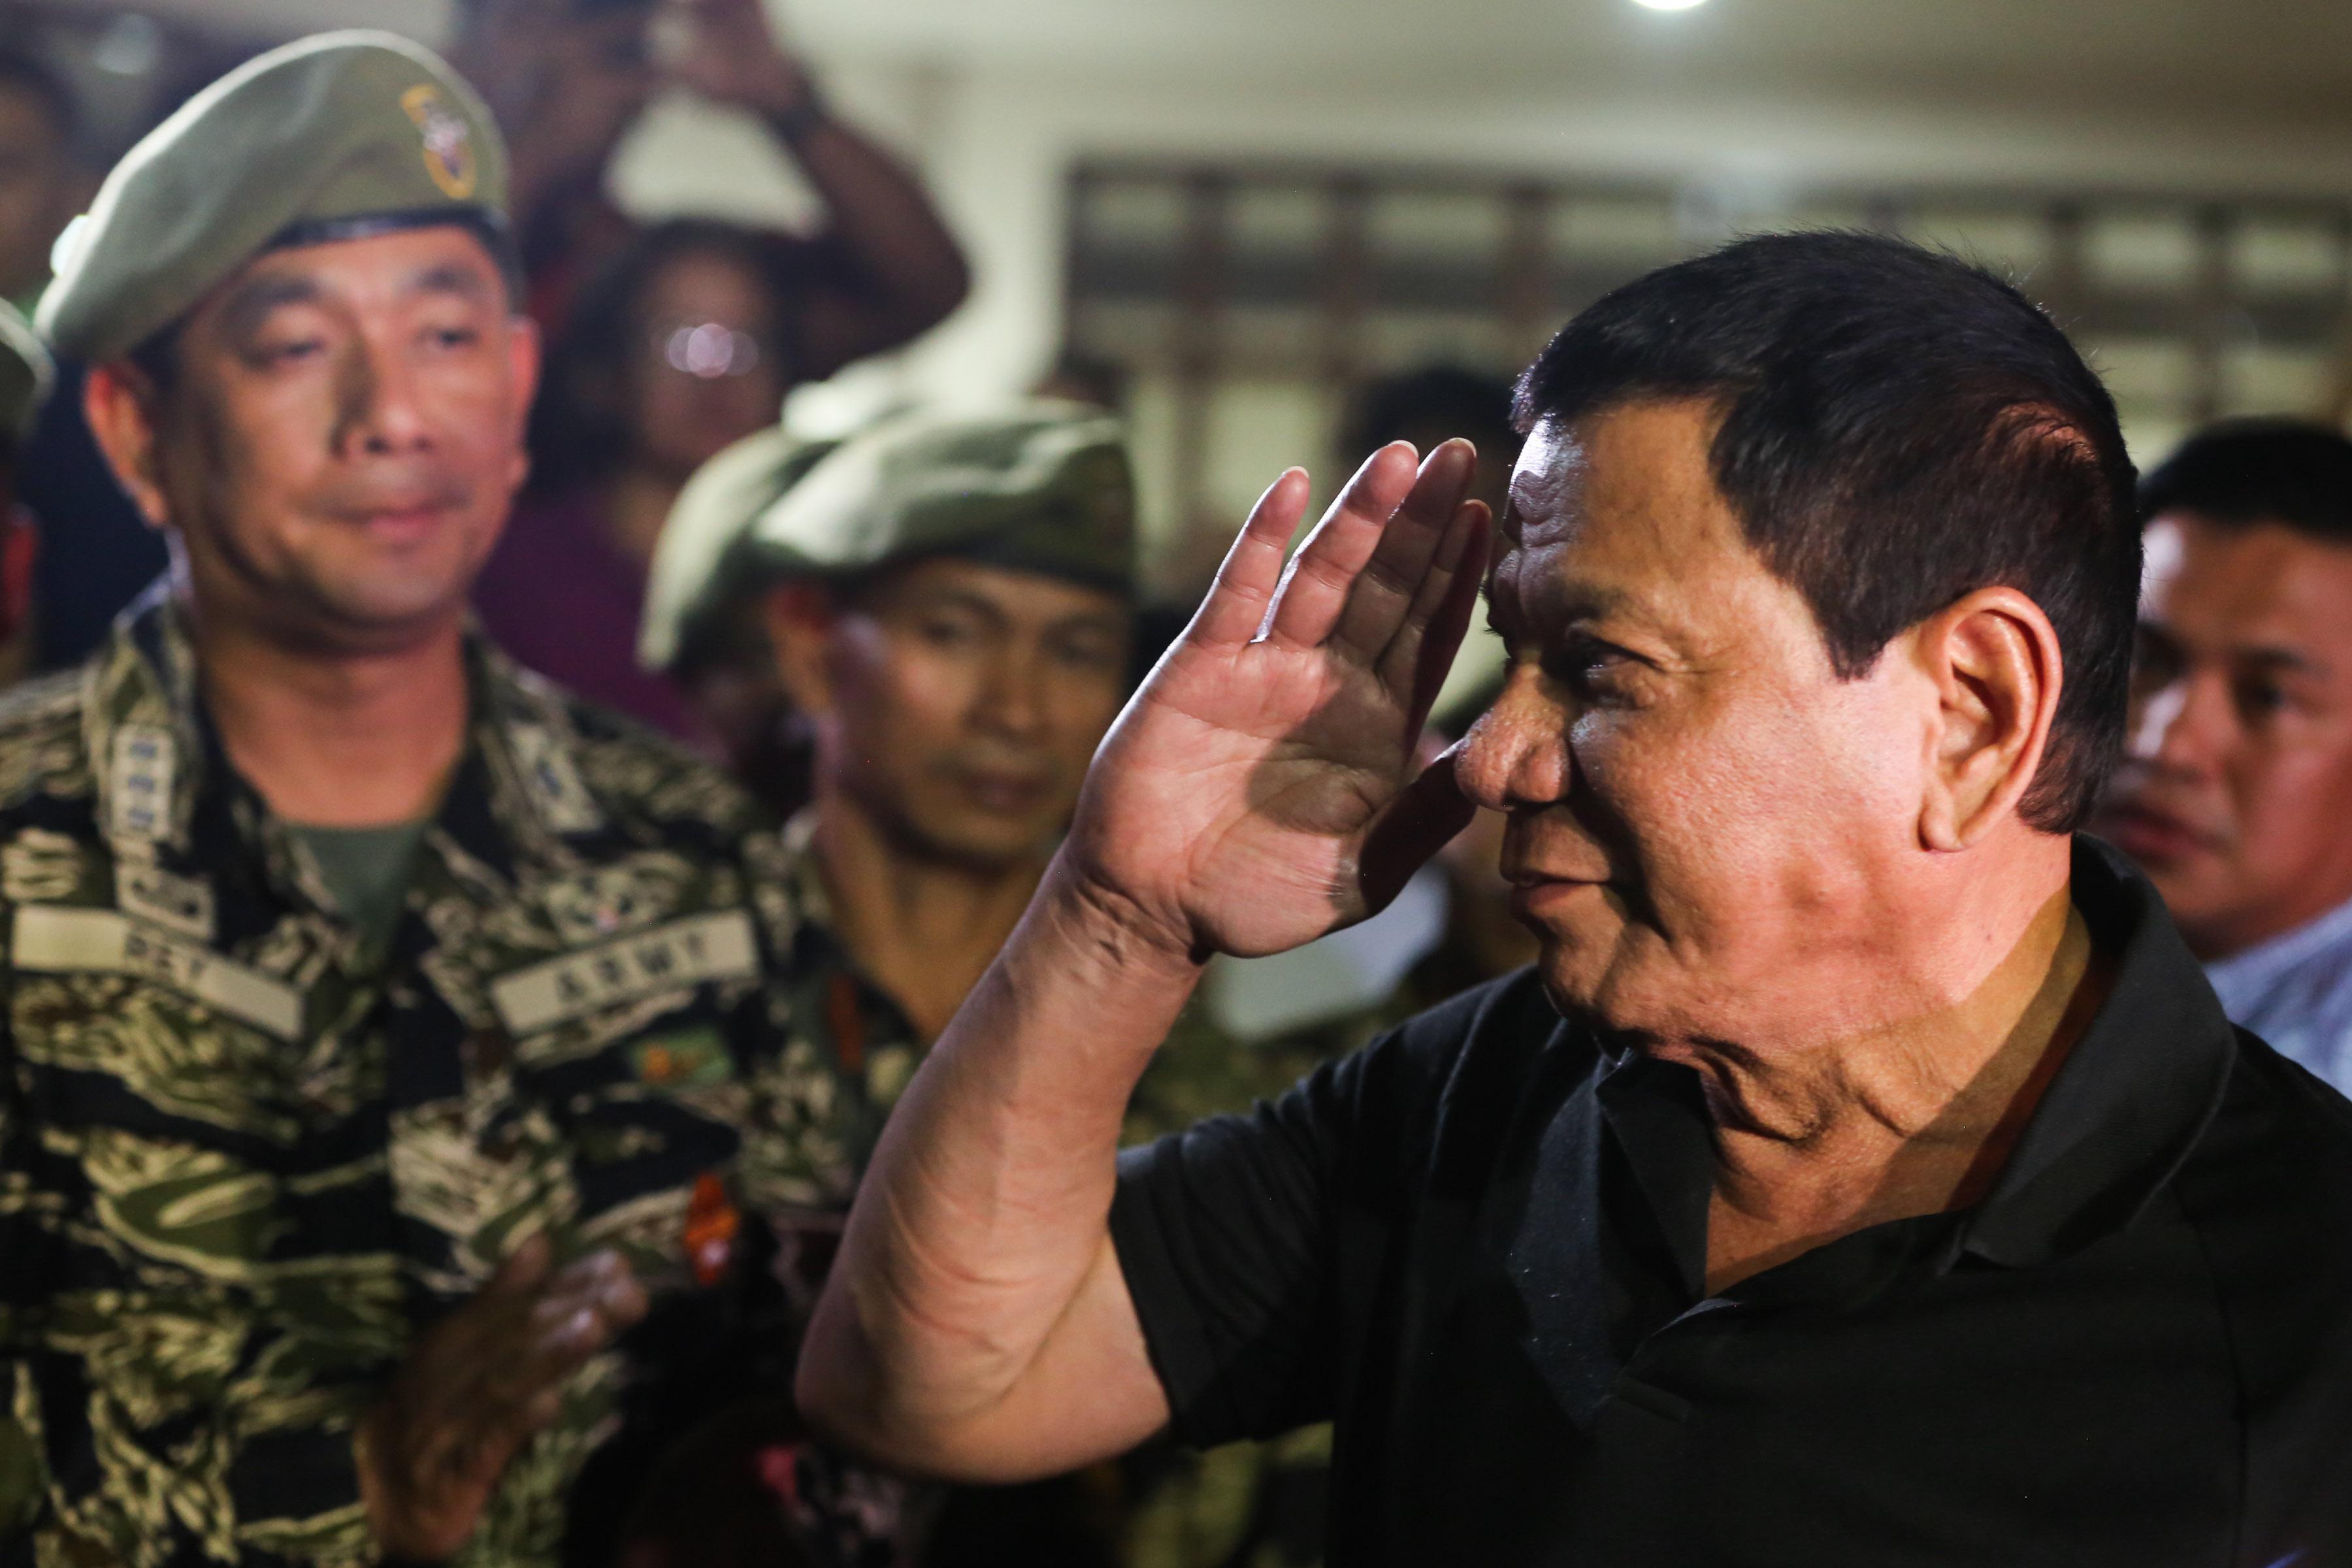 SALUTE. In this file photo, President Duterte visits the wake of slain Captain Clinton Capio at the Libingan ng mga Bayani in Fort Bonifacio on January 16, 2017. File photo courtesy of Malacau00f1ang